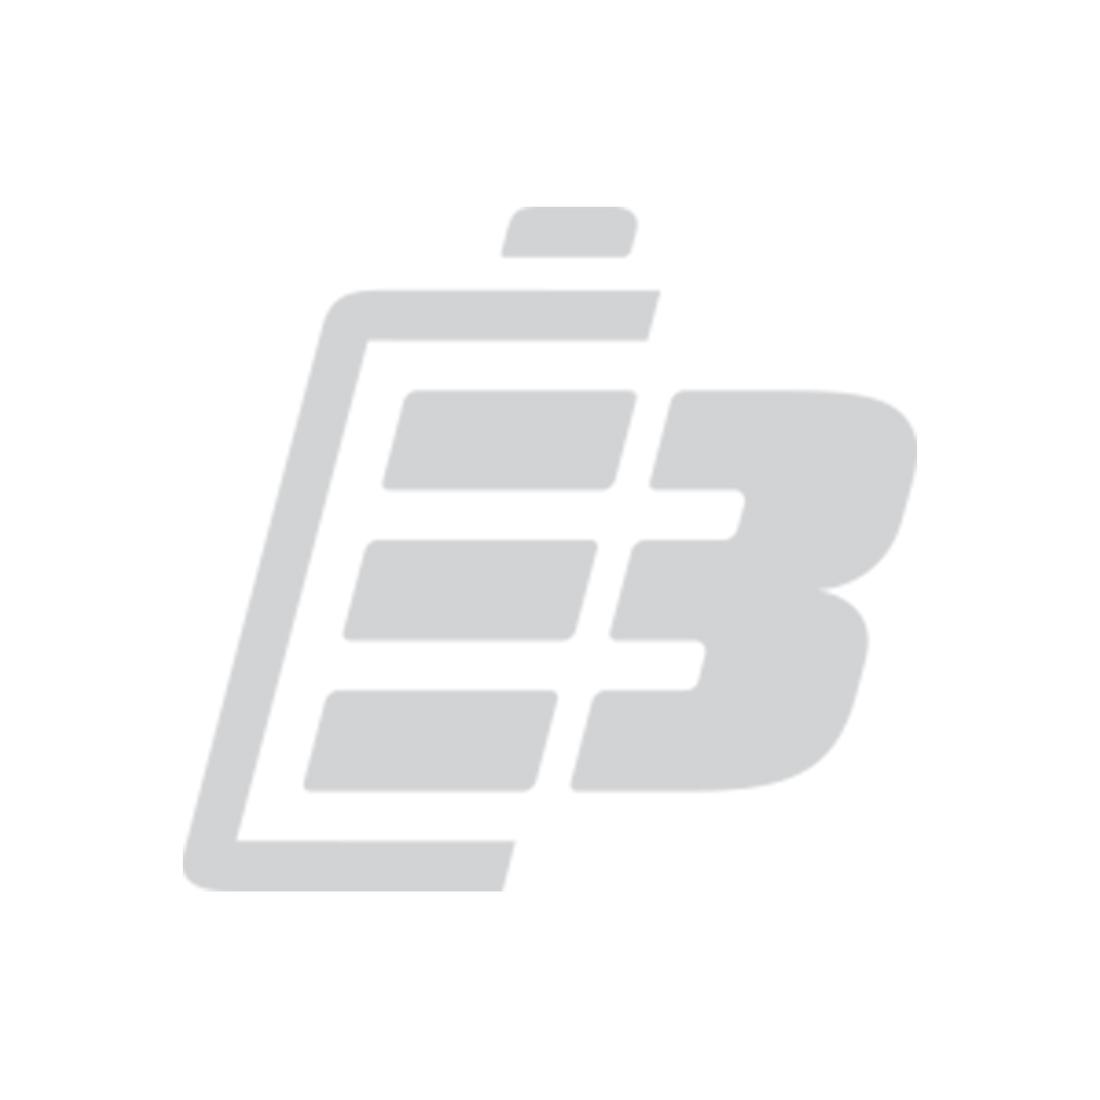 Smartphone battery Acer Liquid Gallant Duo_1